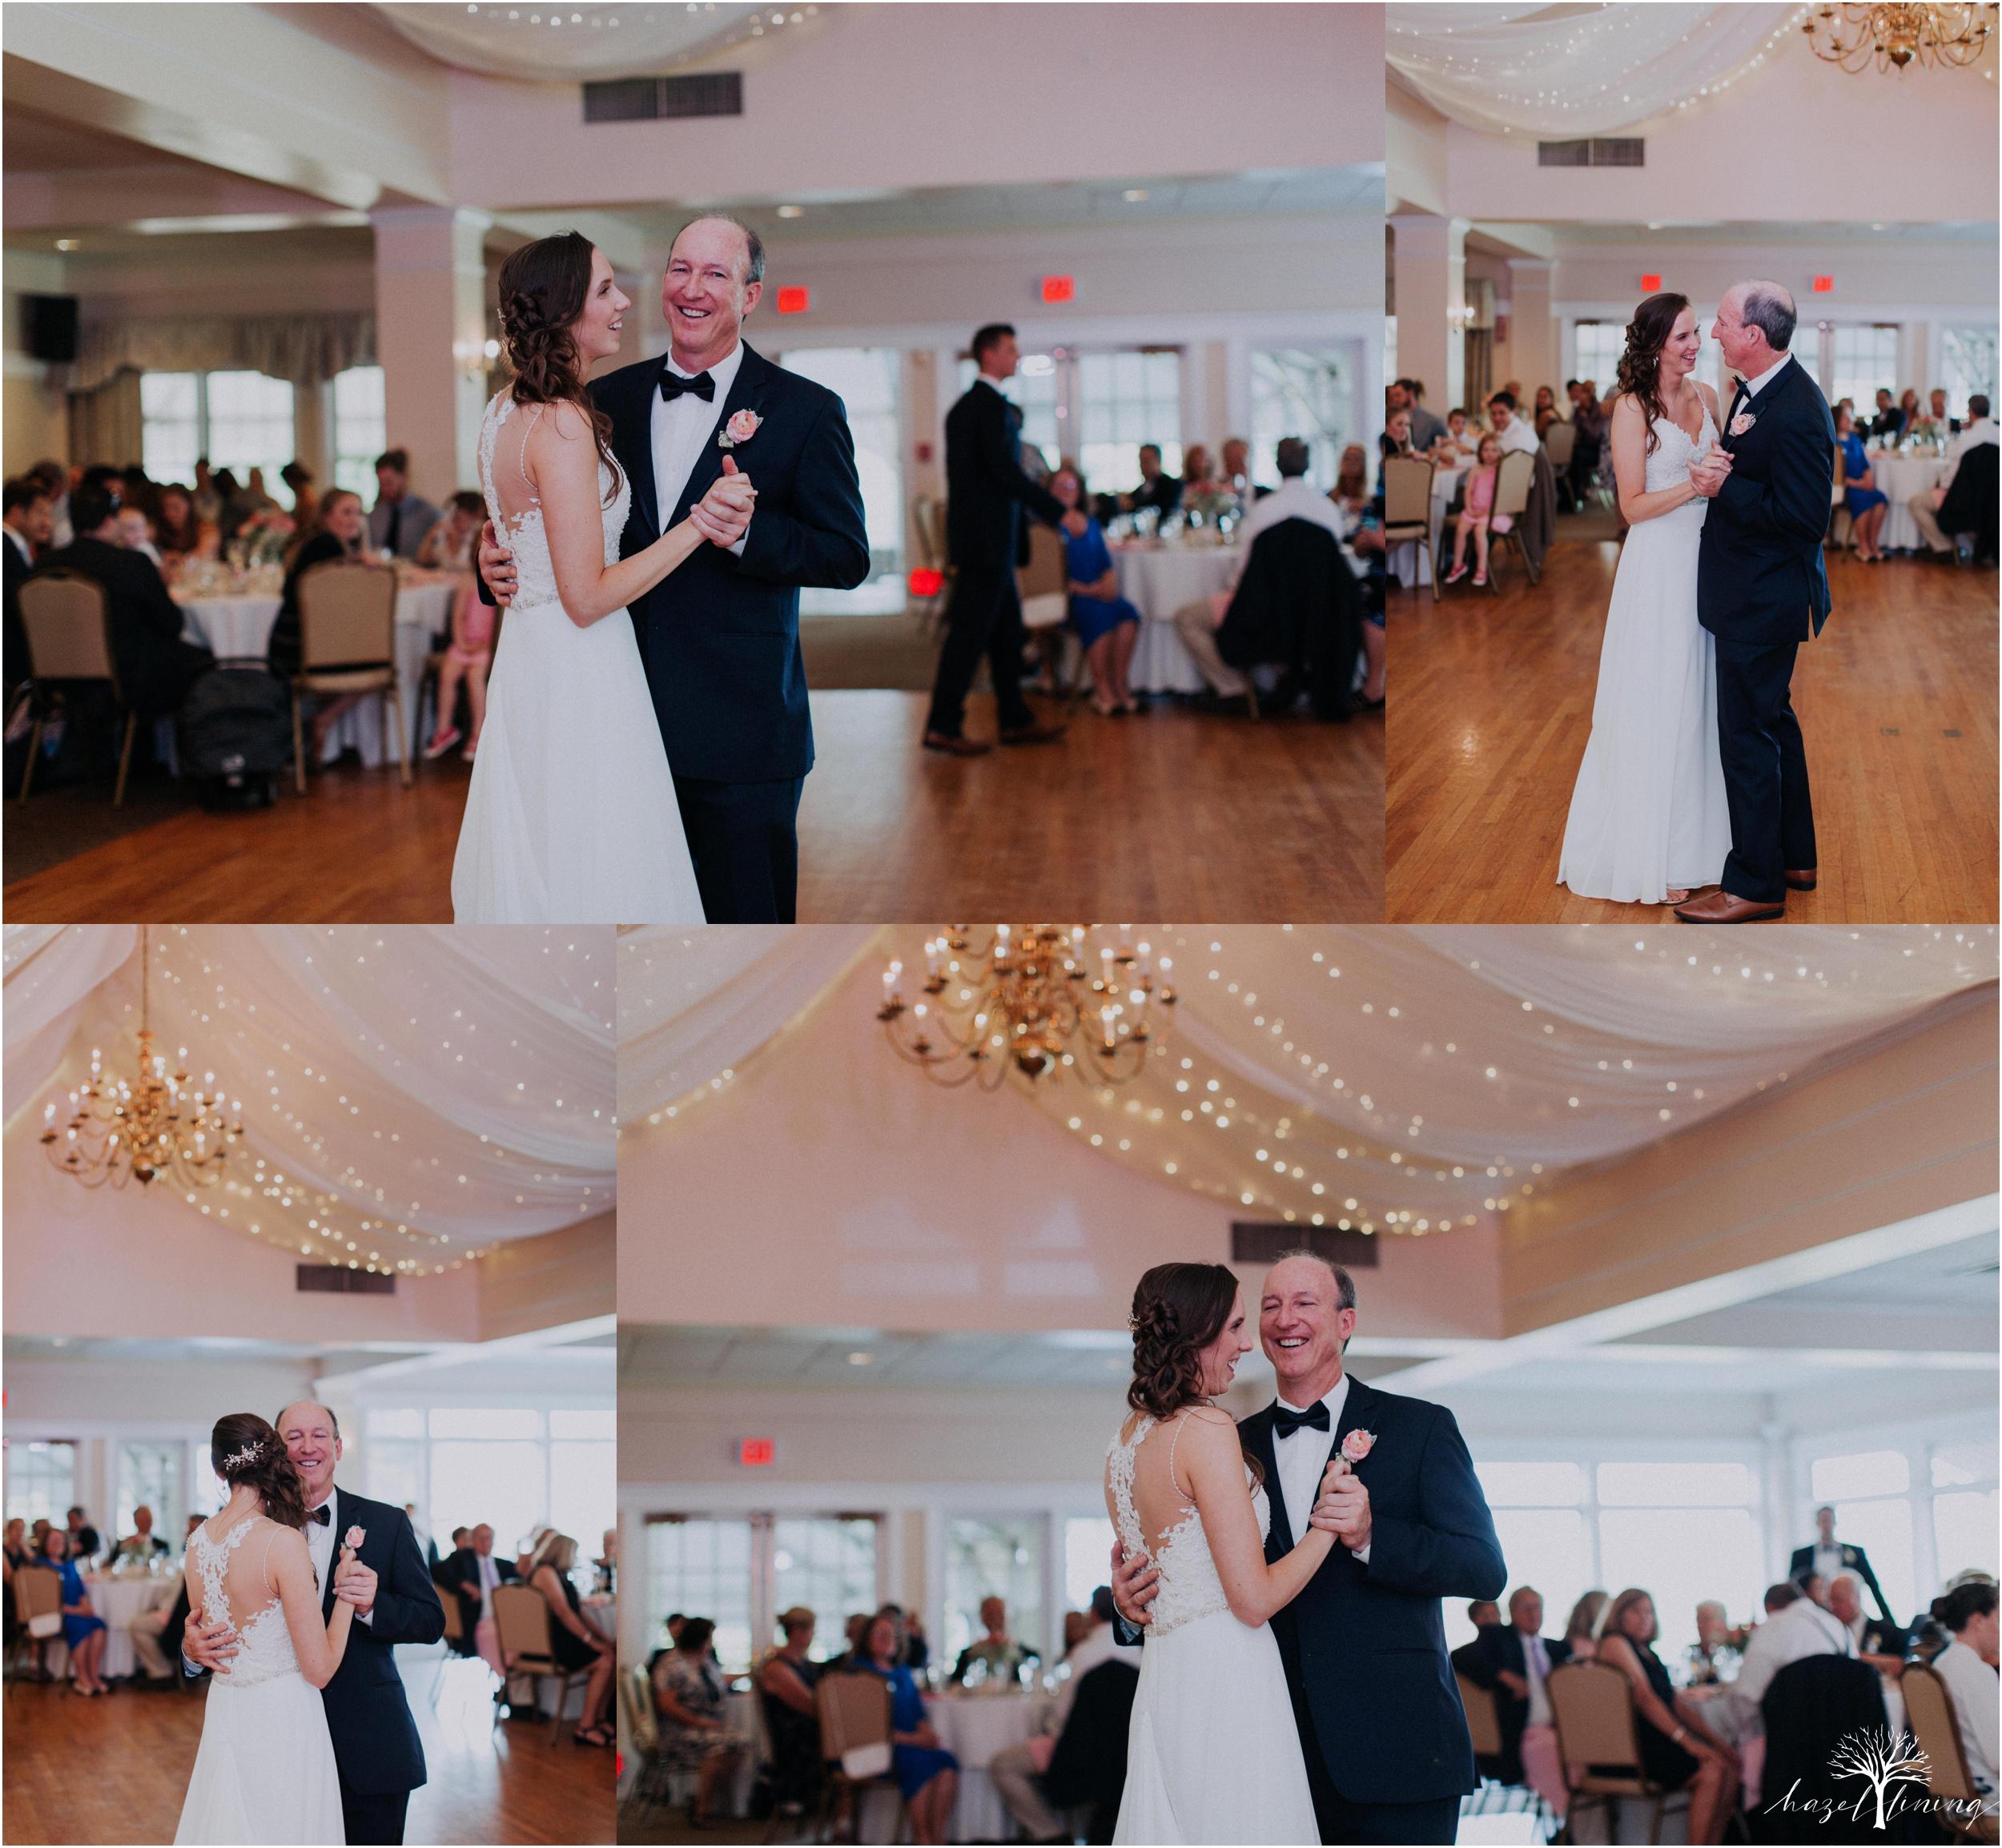 hazel-lining-travel-wedding-elopement-photography_0138.jpg